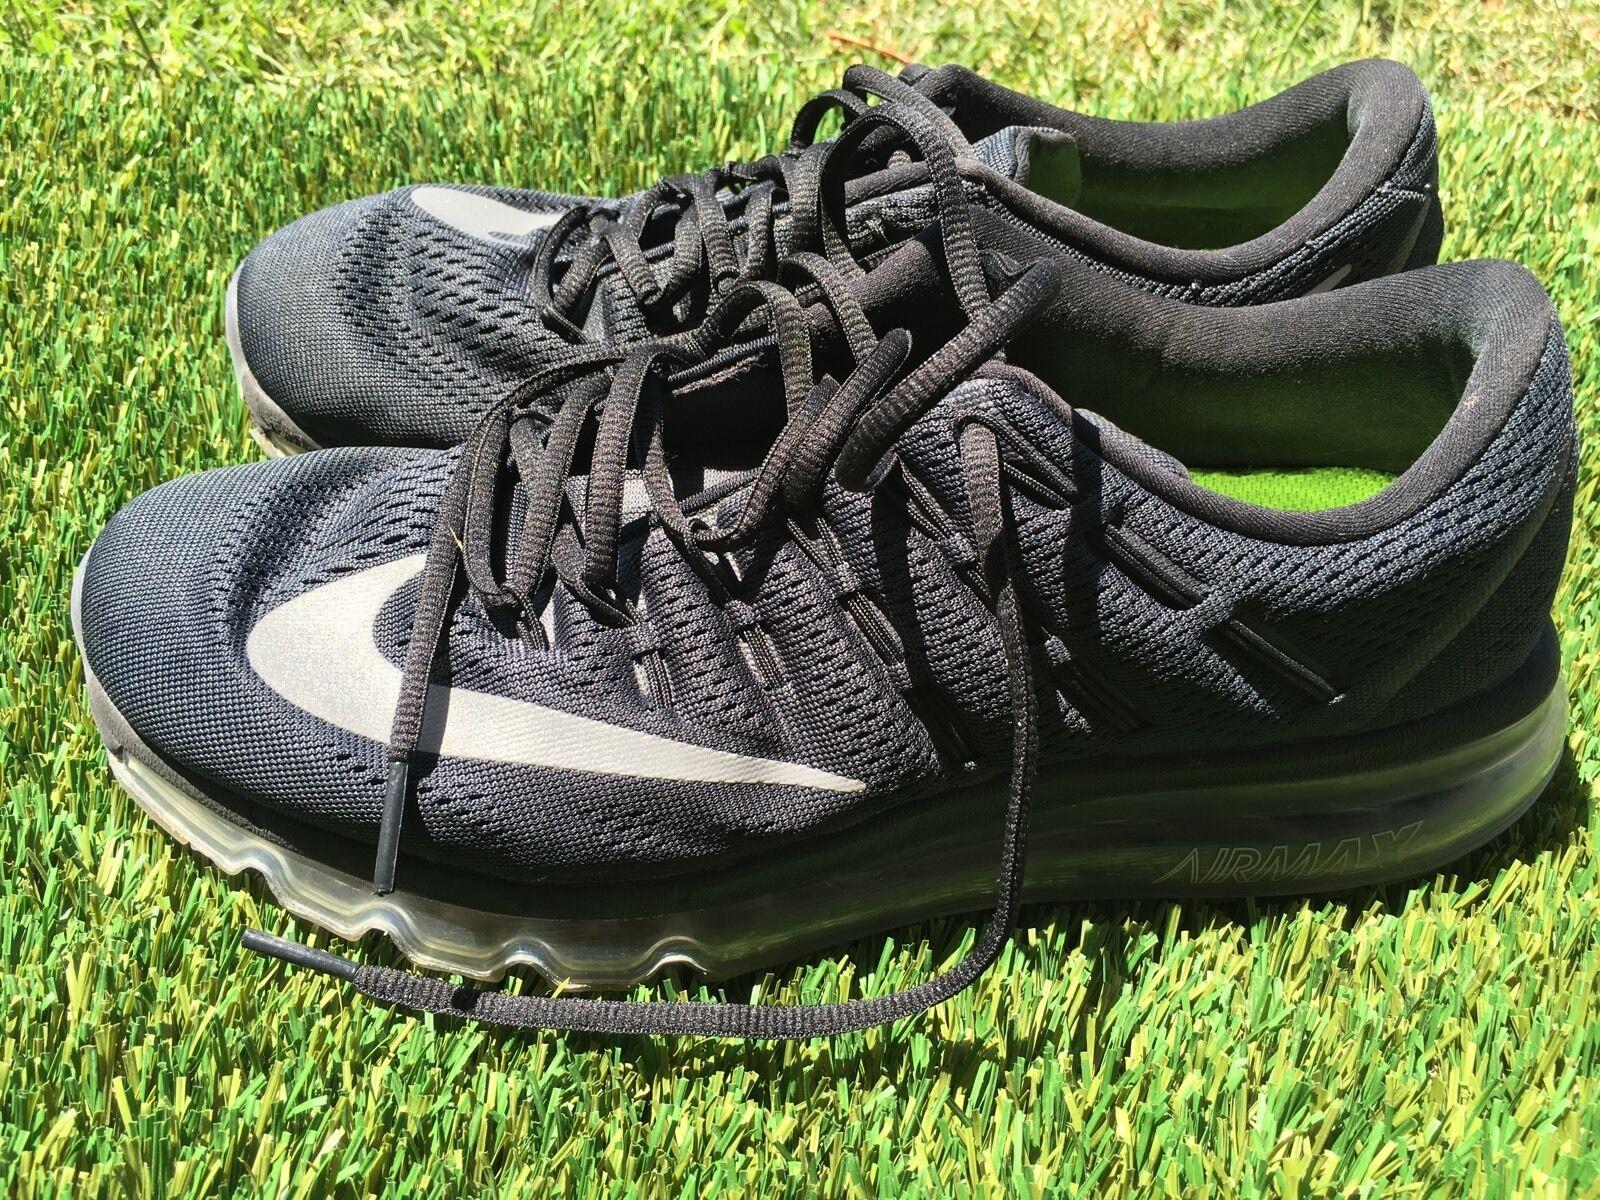 Mens Nike Air Max 2018 806771-001 Black Running Shoes Size 8.5